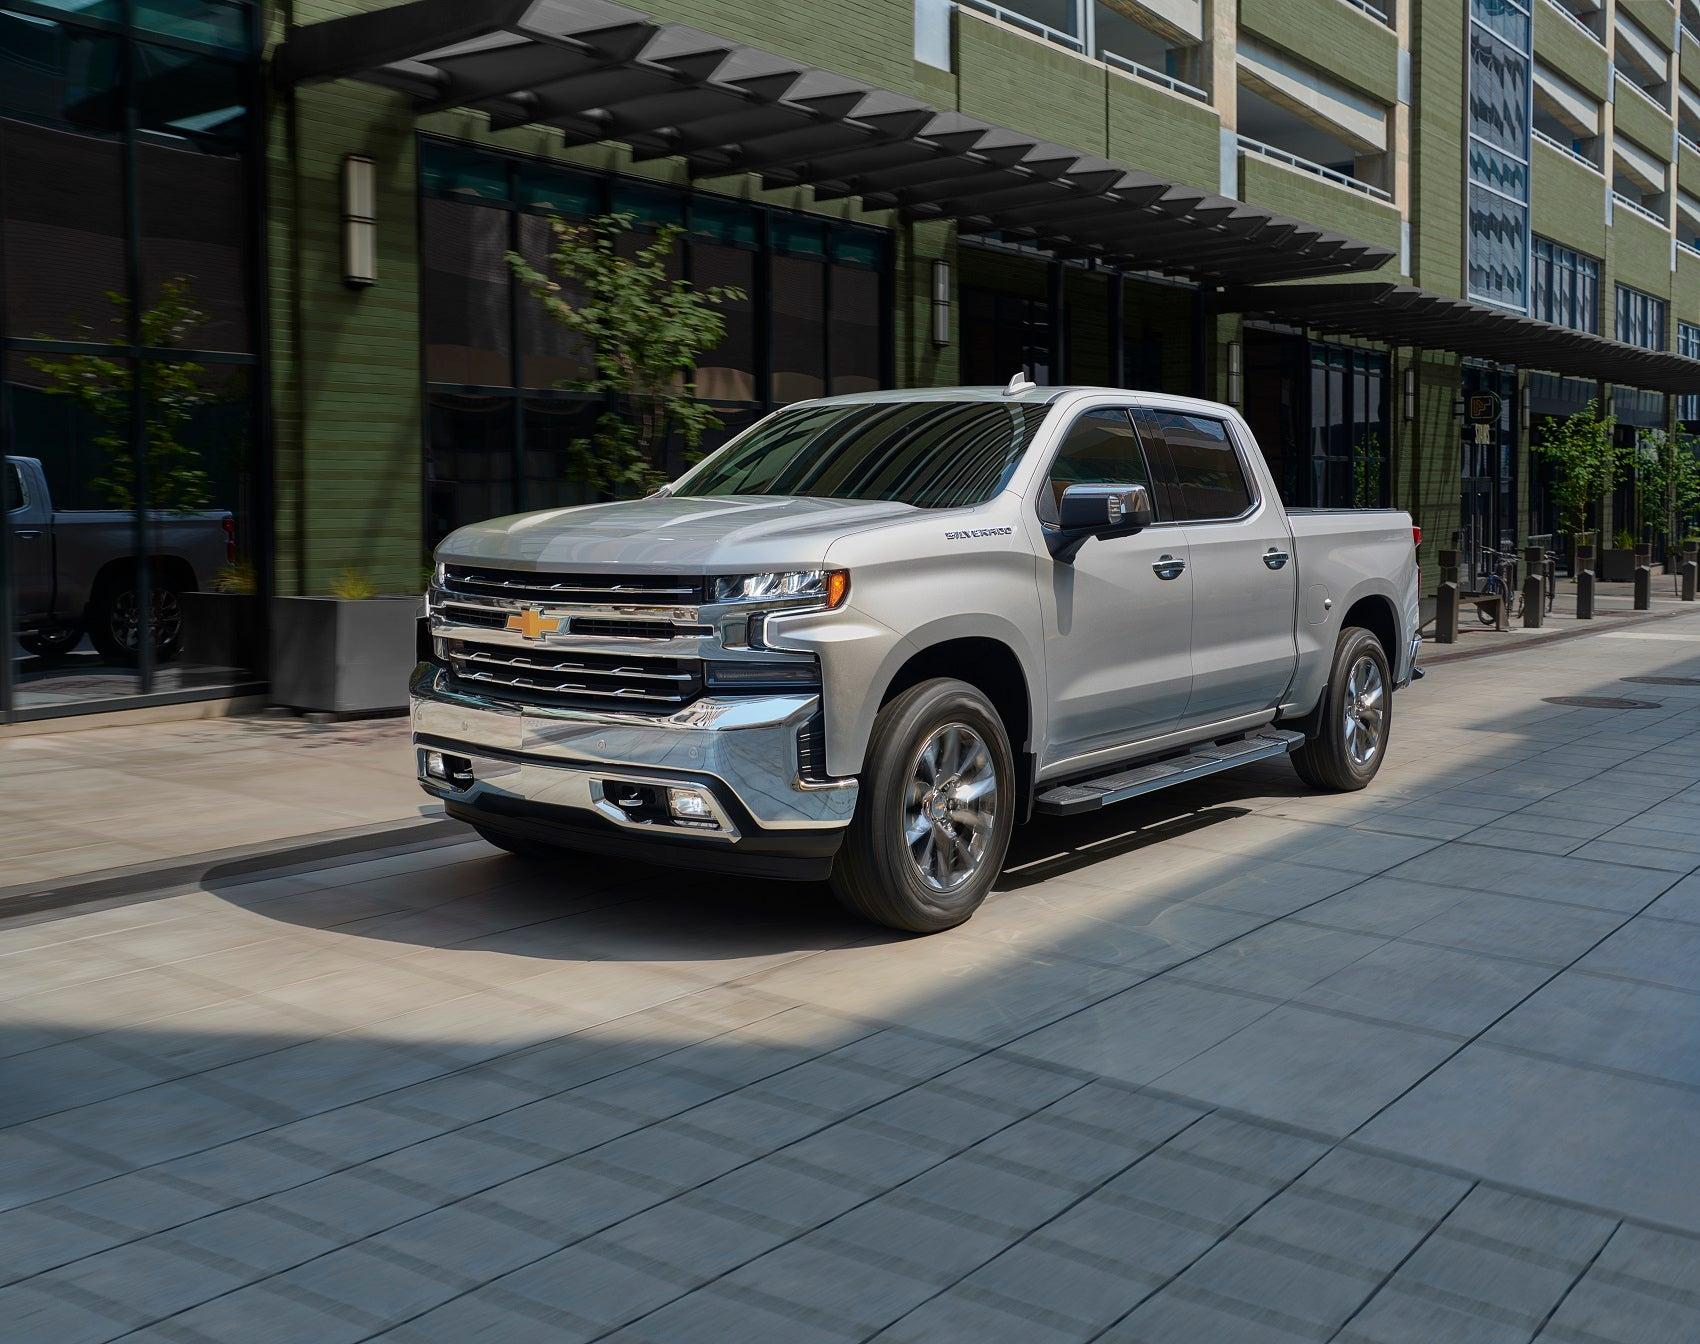 Kelebihan Dealer Chevrolet Harga